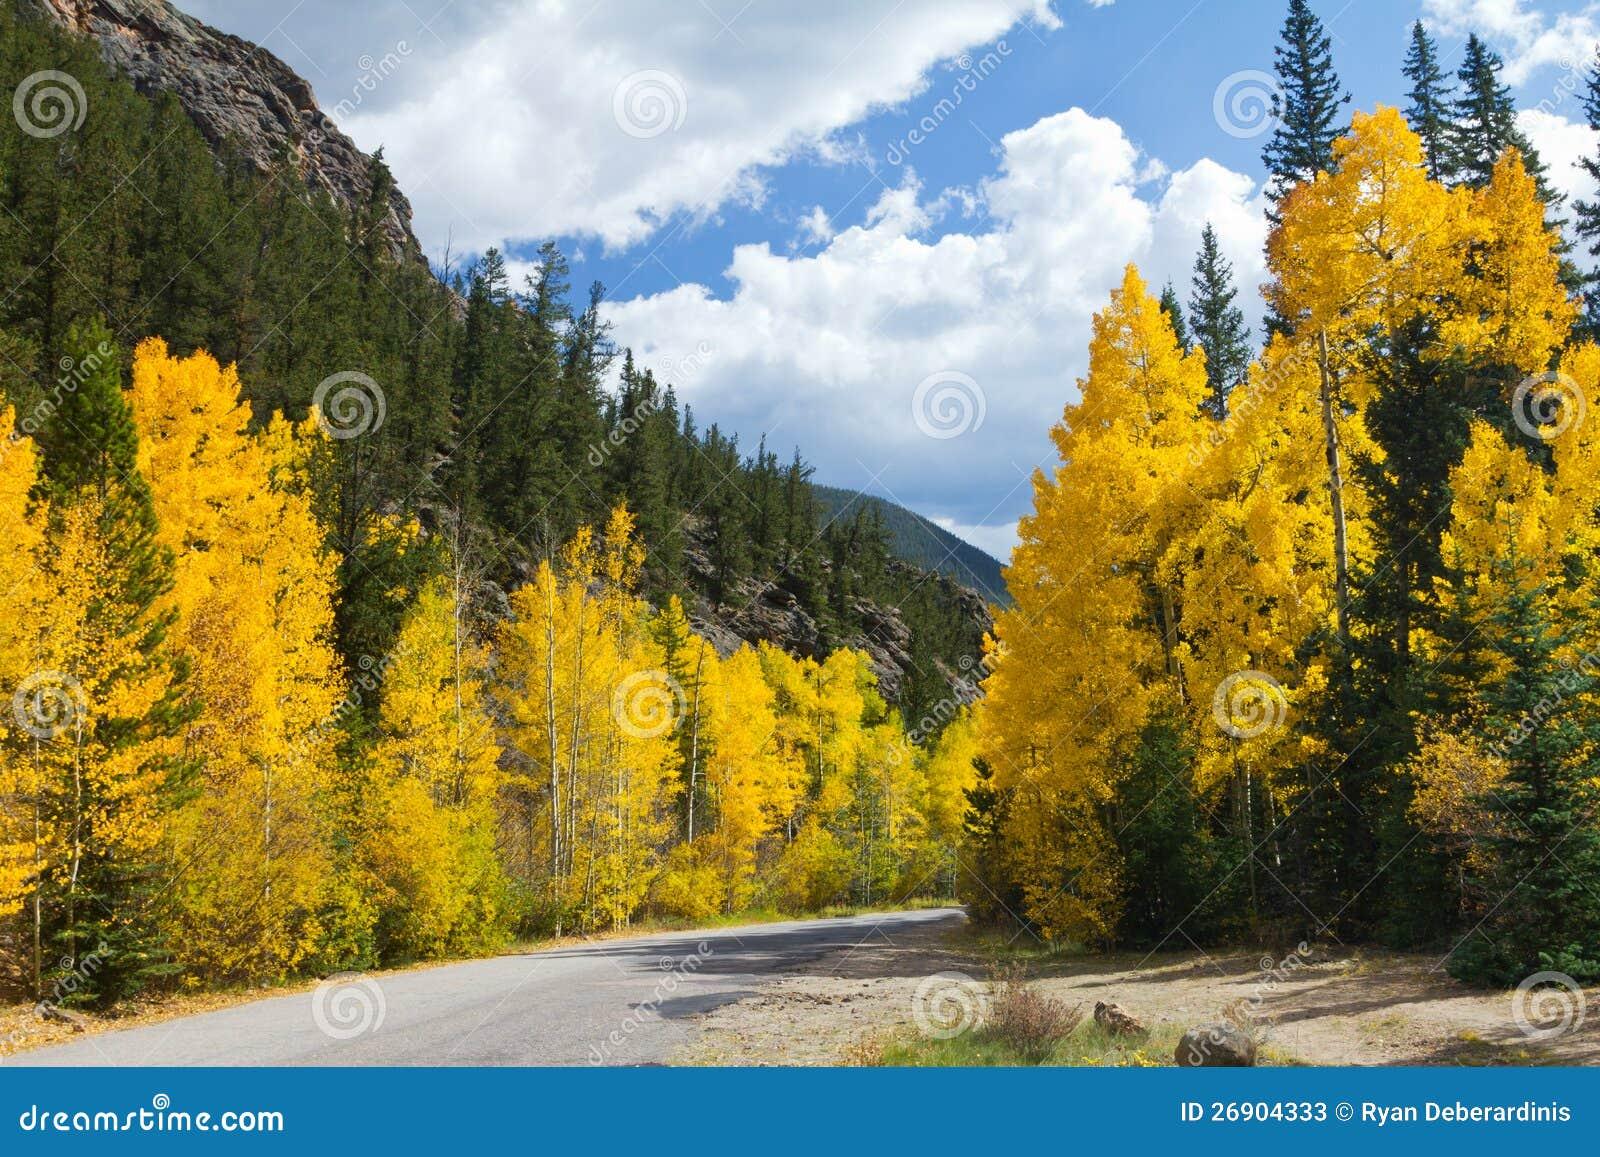 Download Scenic Road In Colorado Fall Aspens Stock Image - Image of autumn, hillside: 26904333